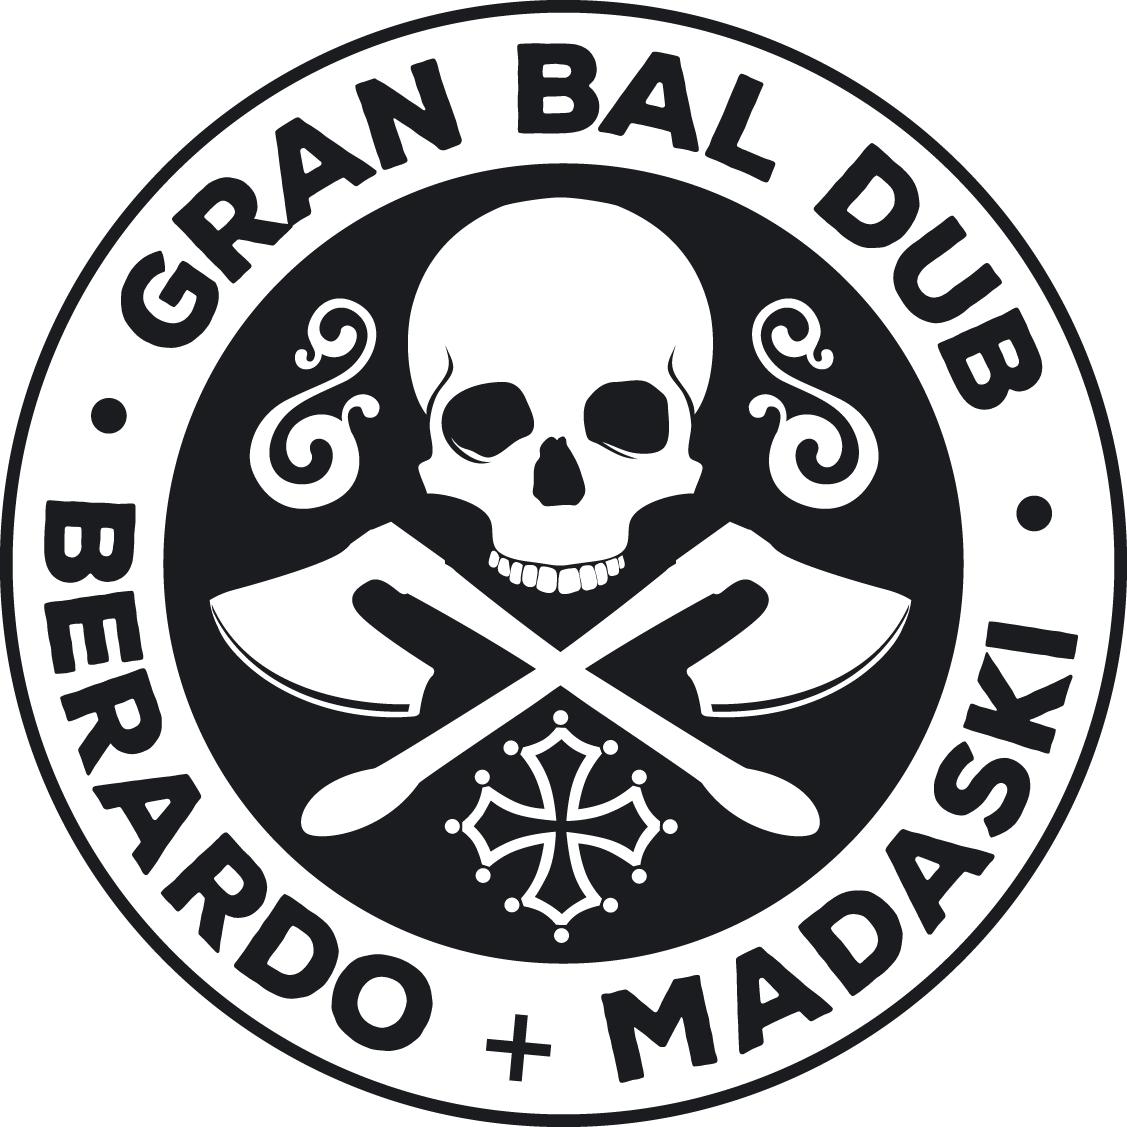 Berardo  Madaski - Gran Bal Dub 1 - fanzine